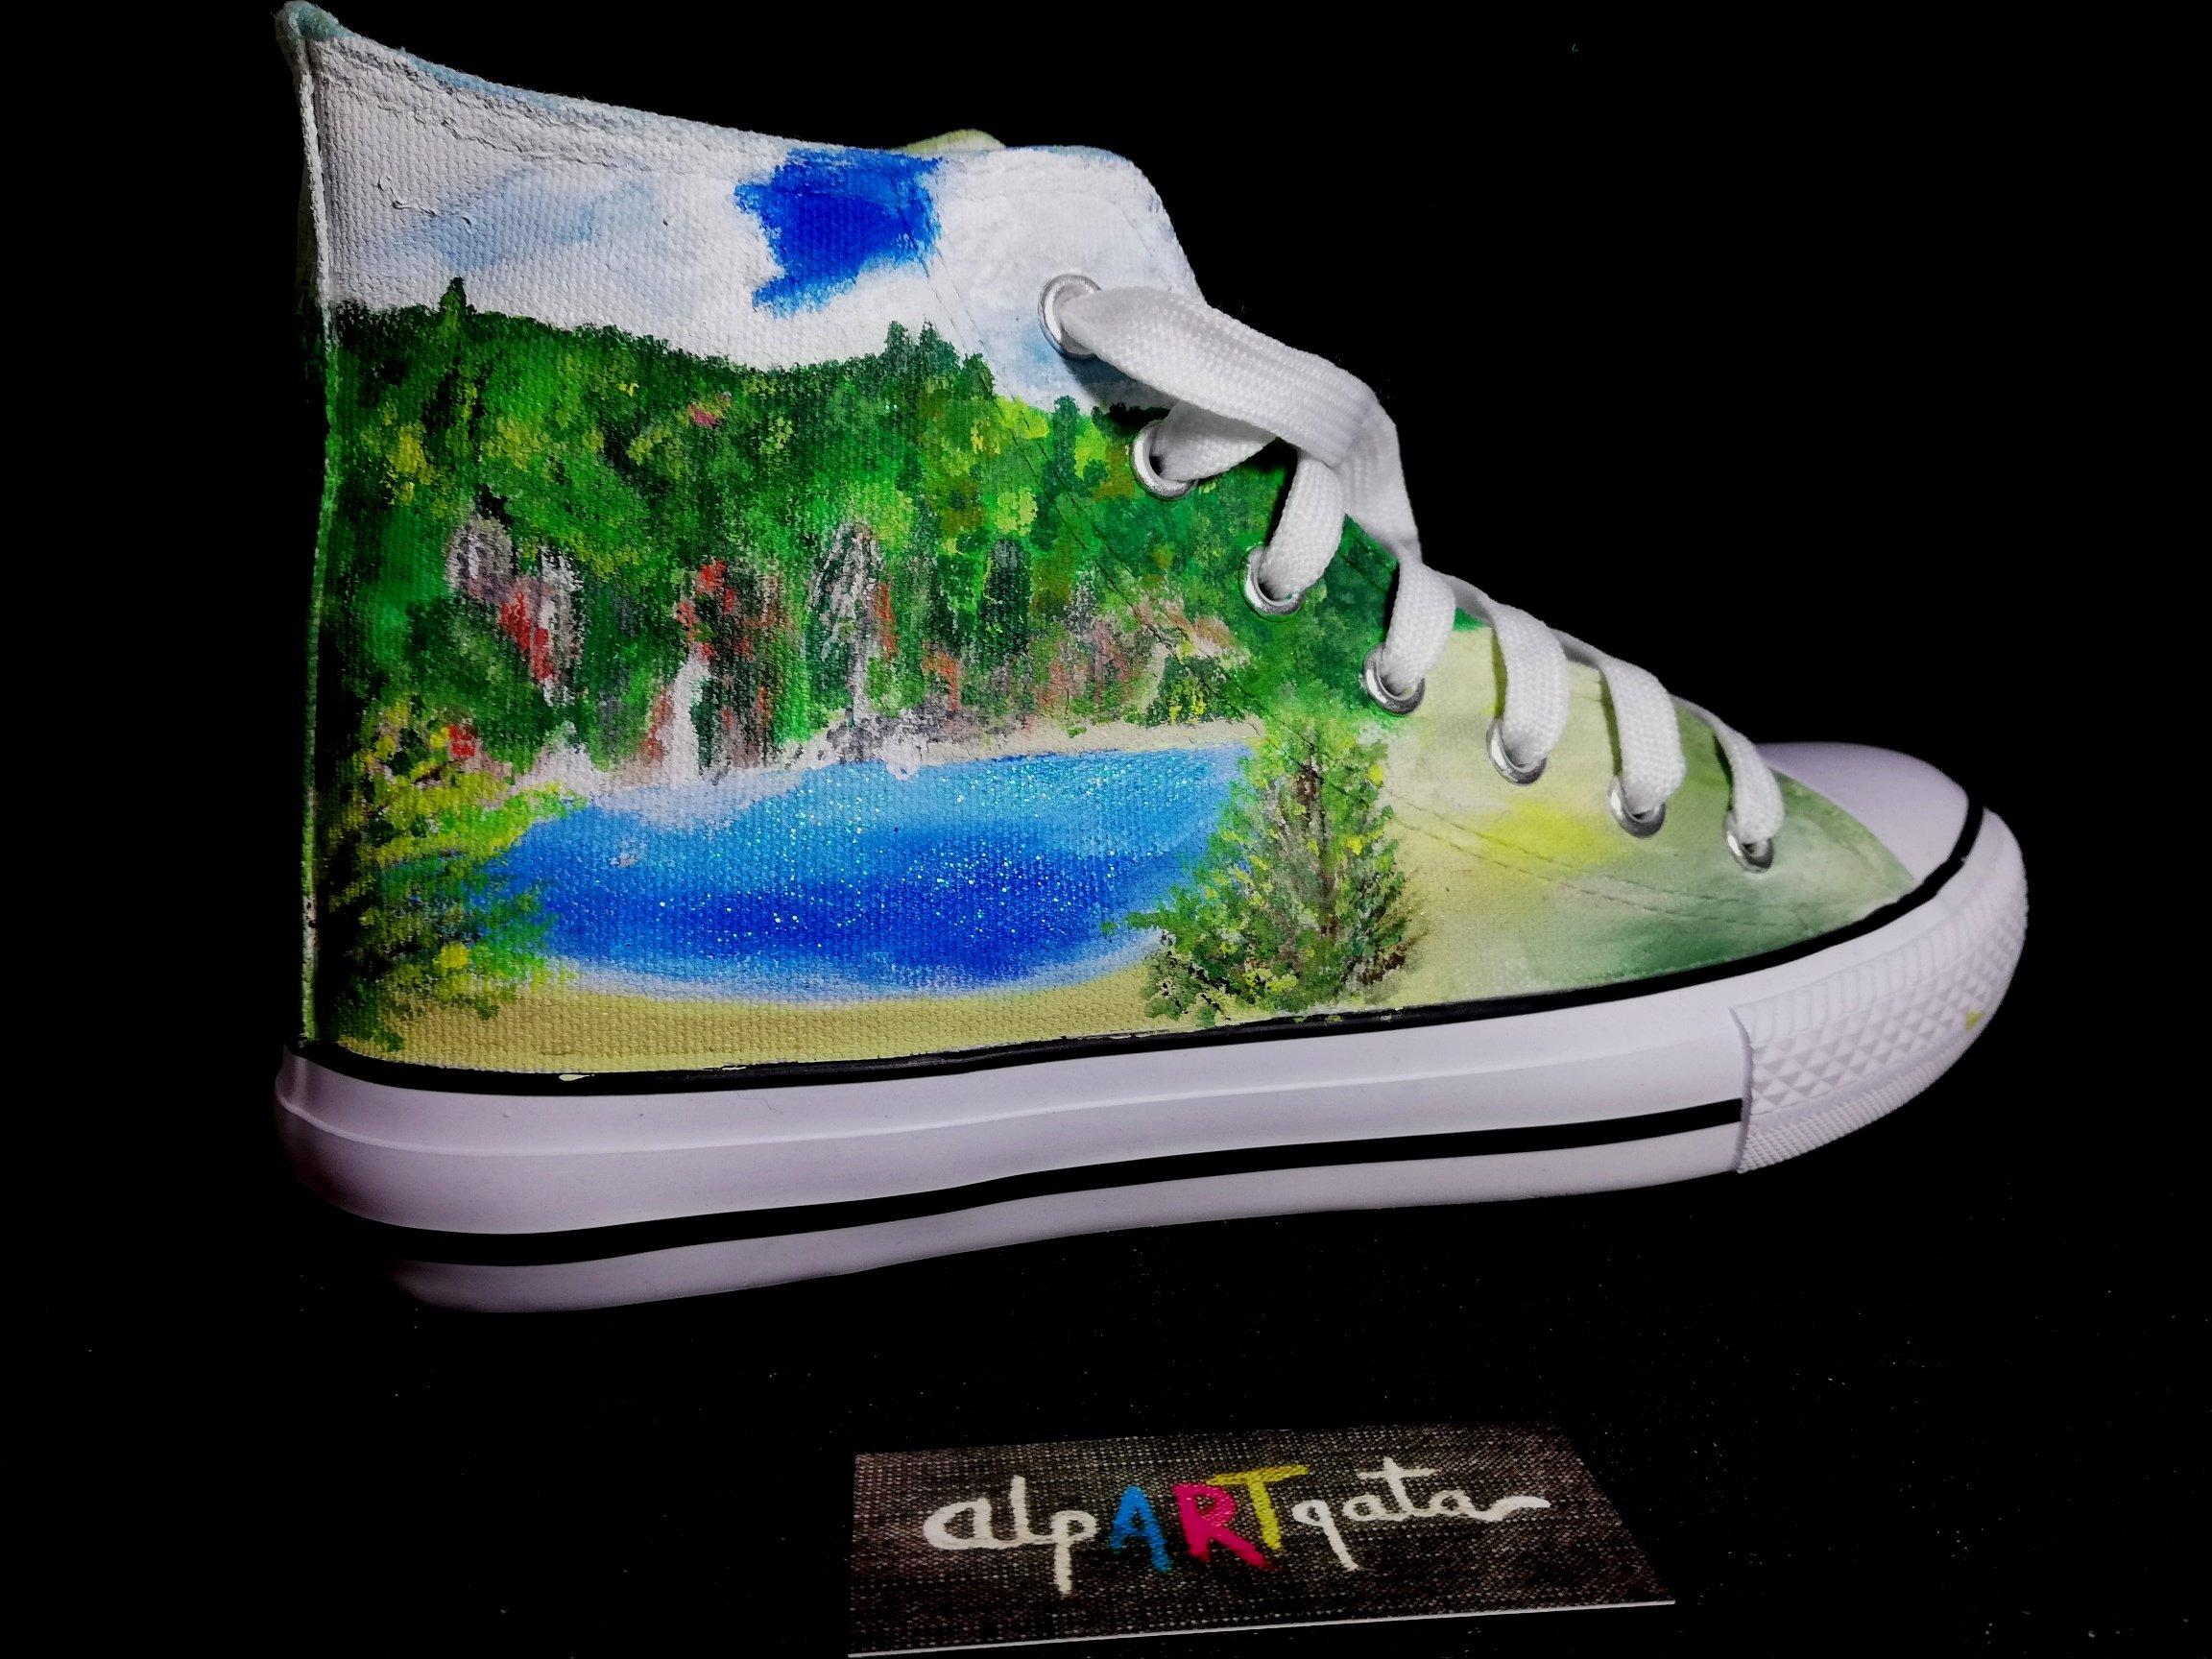 wpid-zapatillas-personalizadas-pintadas-paisajes-alpartgata7517151952106005046.jpg